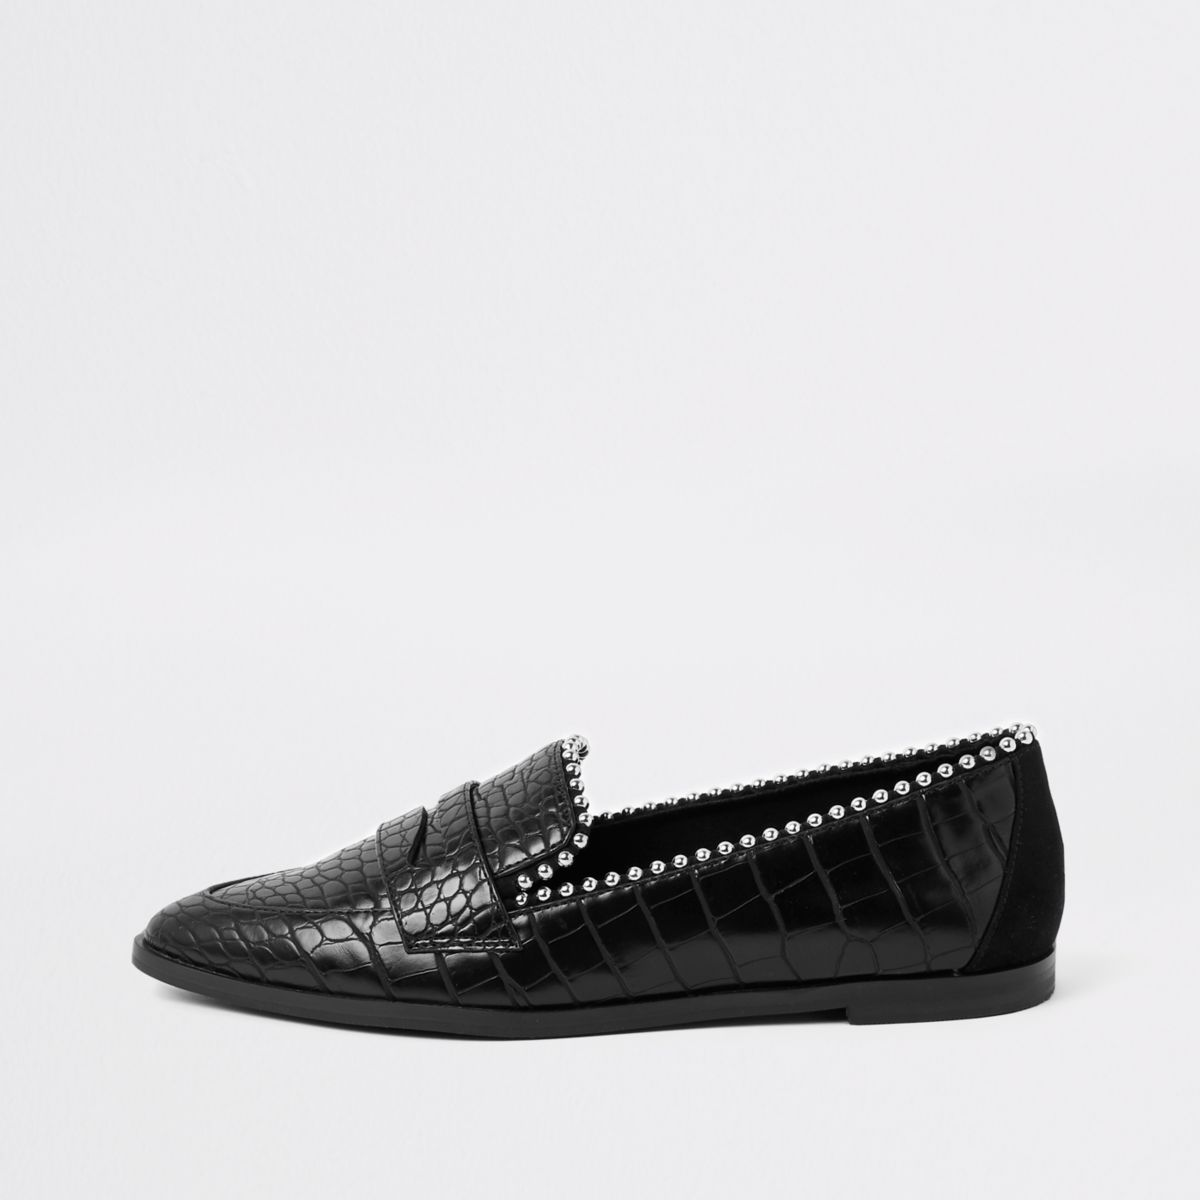 Black croc embossed pearl embellished loafers